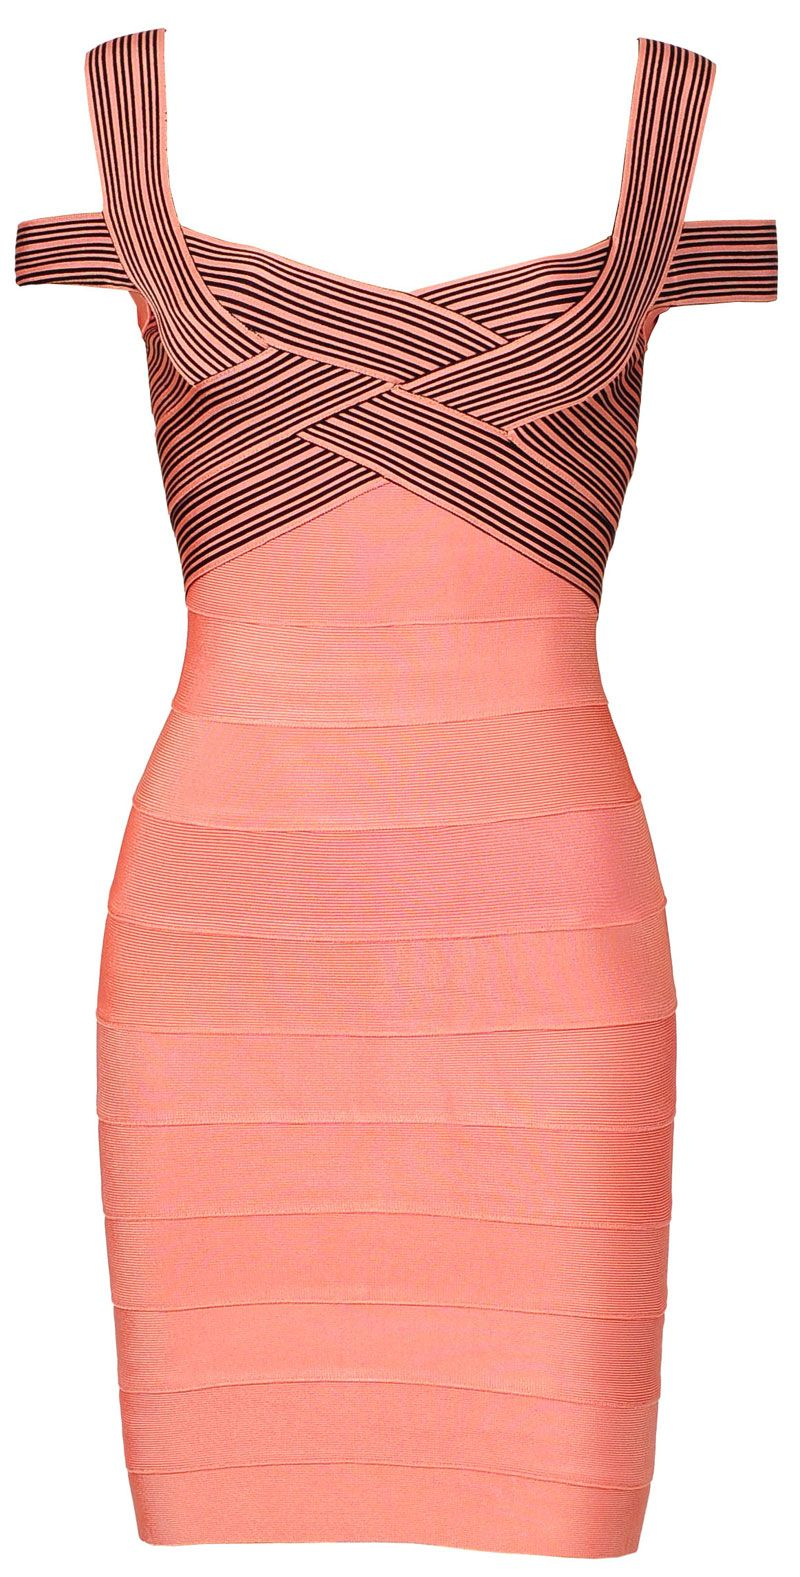 Celeb Boutique Pink Bandage Dress